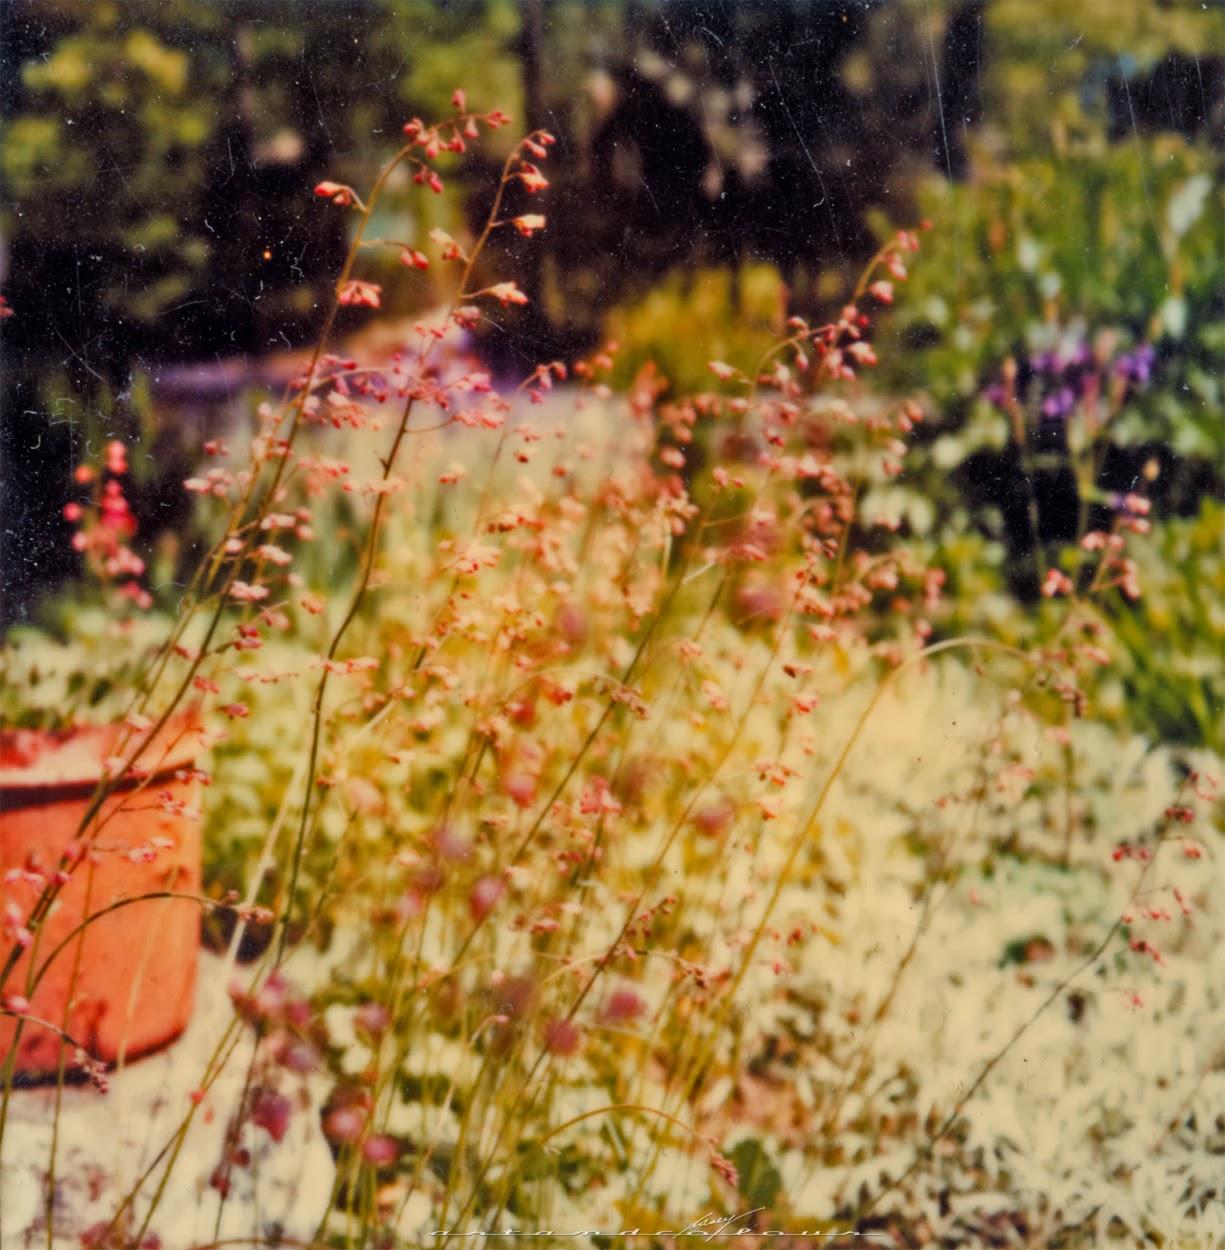 Field Of Flowers Vintage | www.imgkid.com - The Image Kid ...